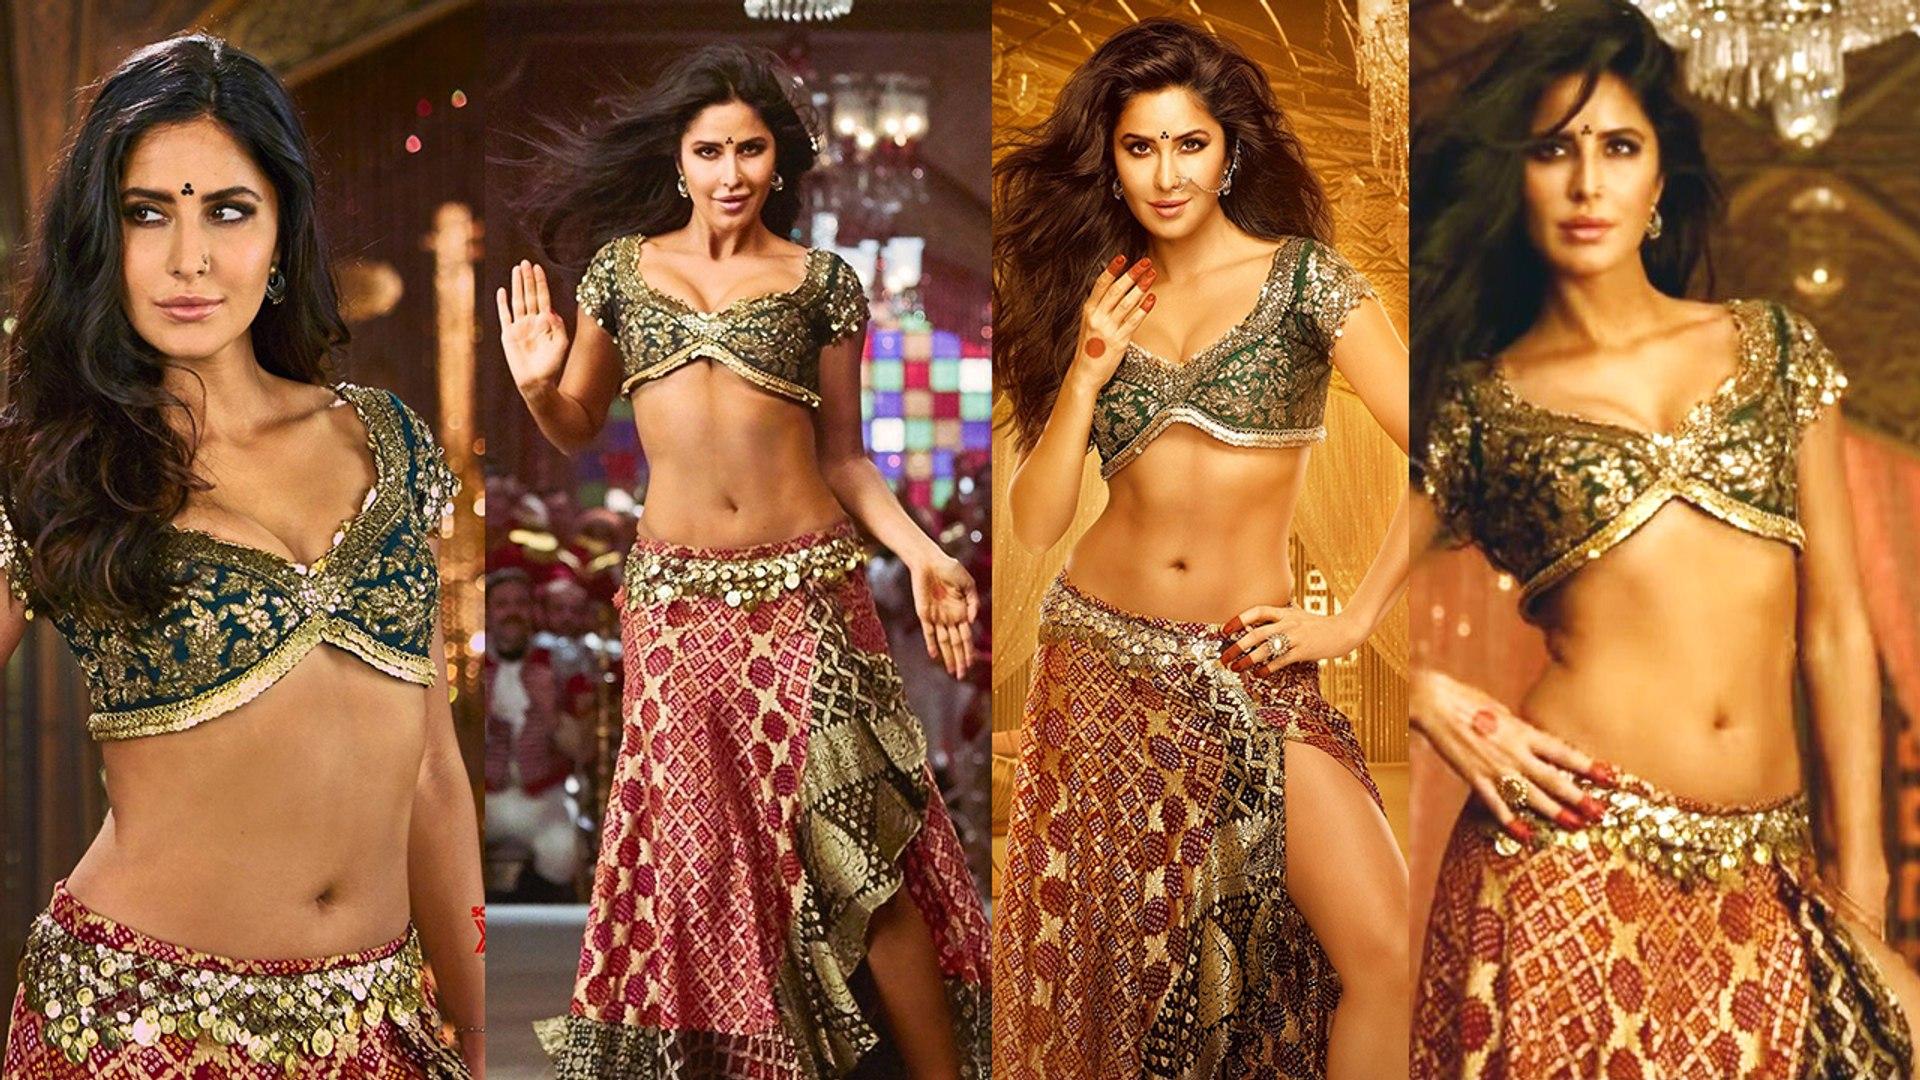 Thugs of Hindostan Movie Songs - Dance by Katrina Kaif